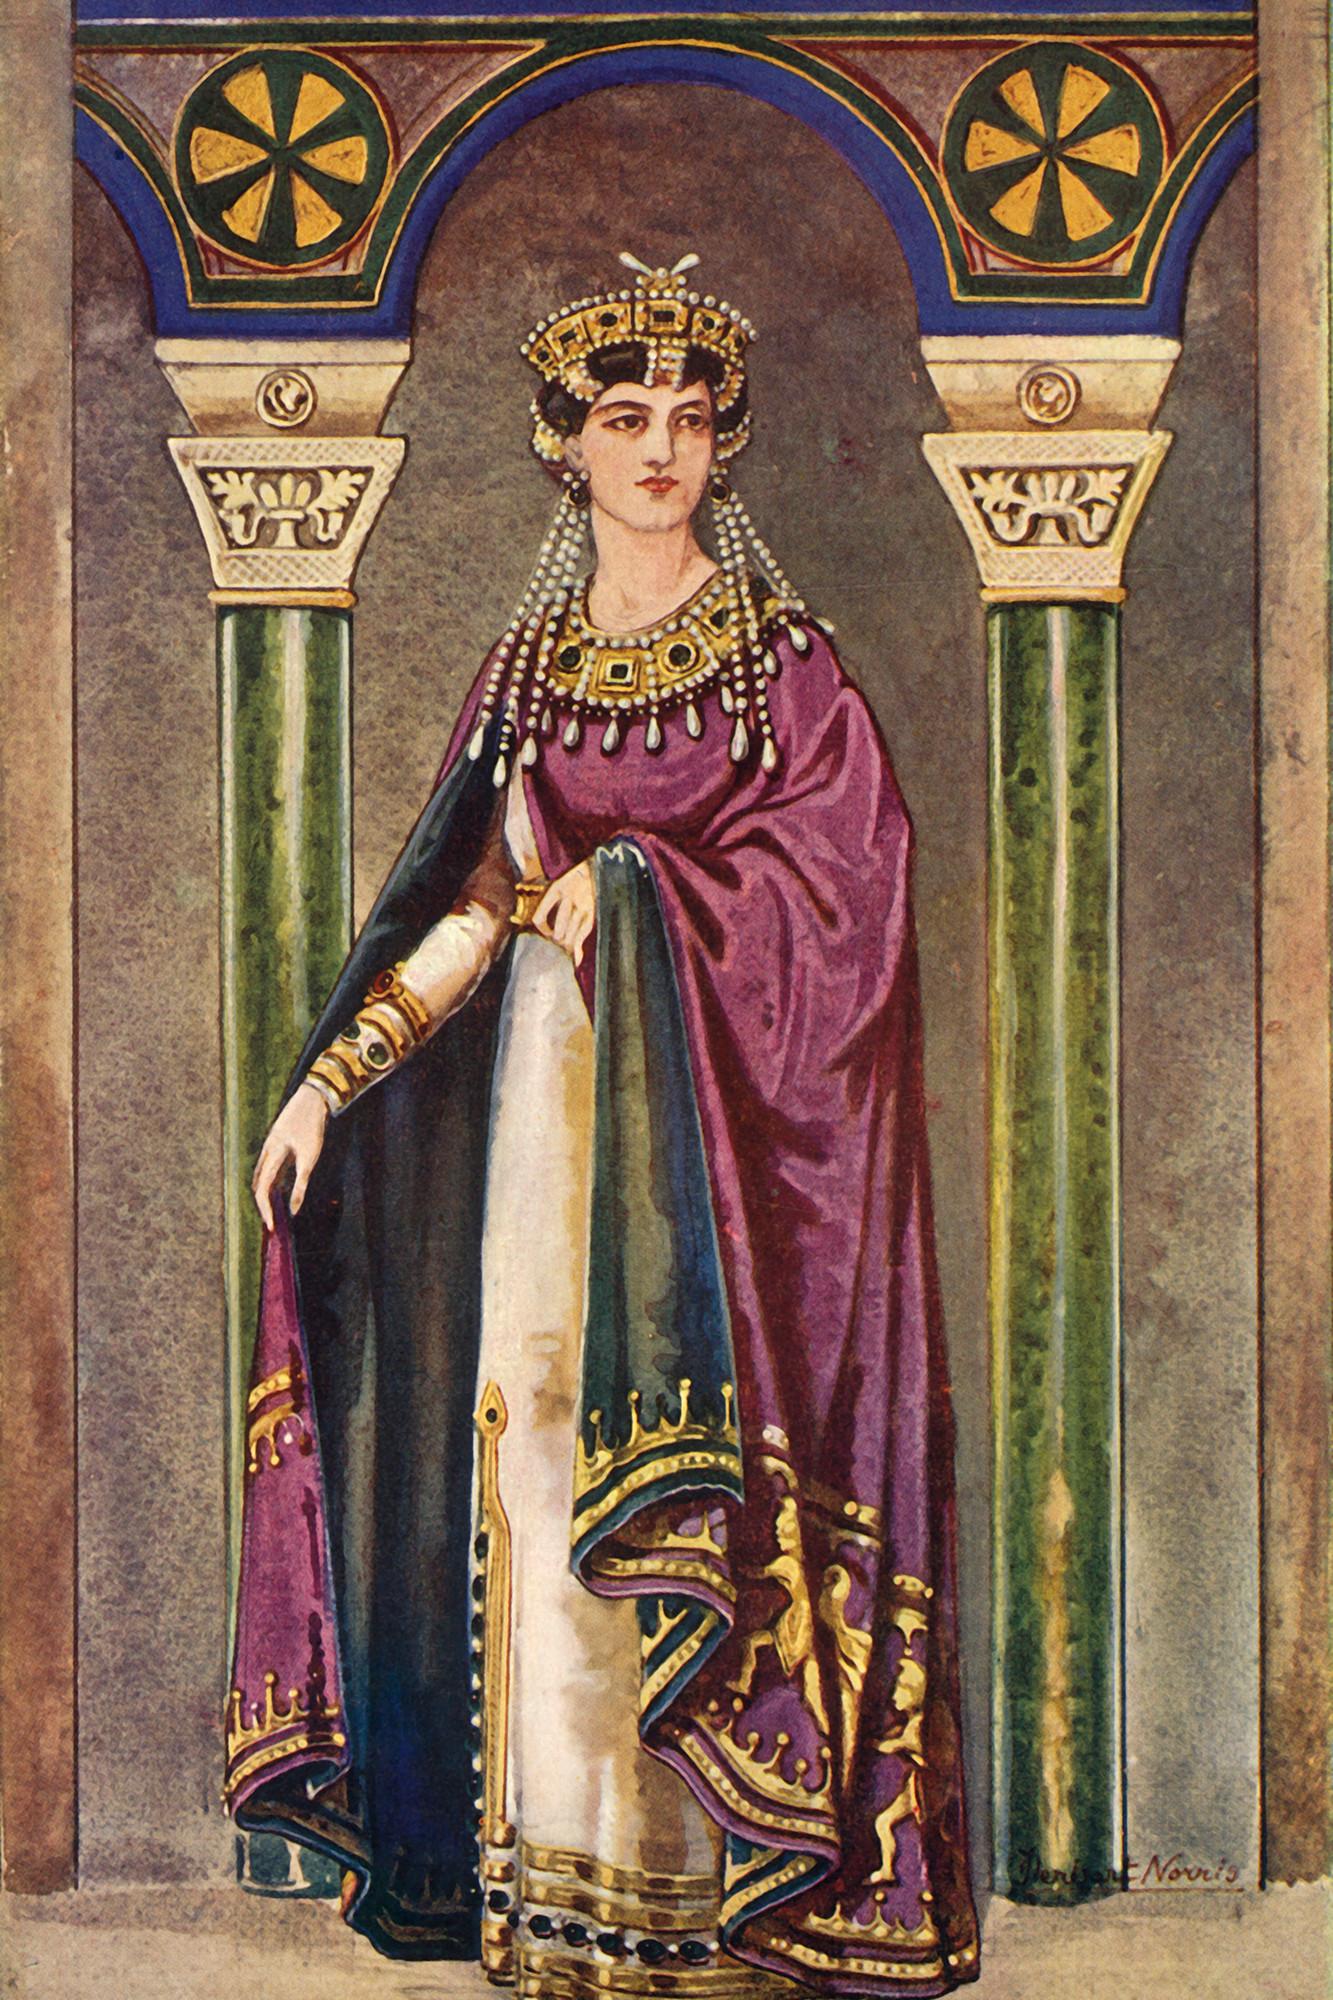 The Empress Theodora - Sixth Century